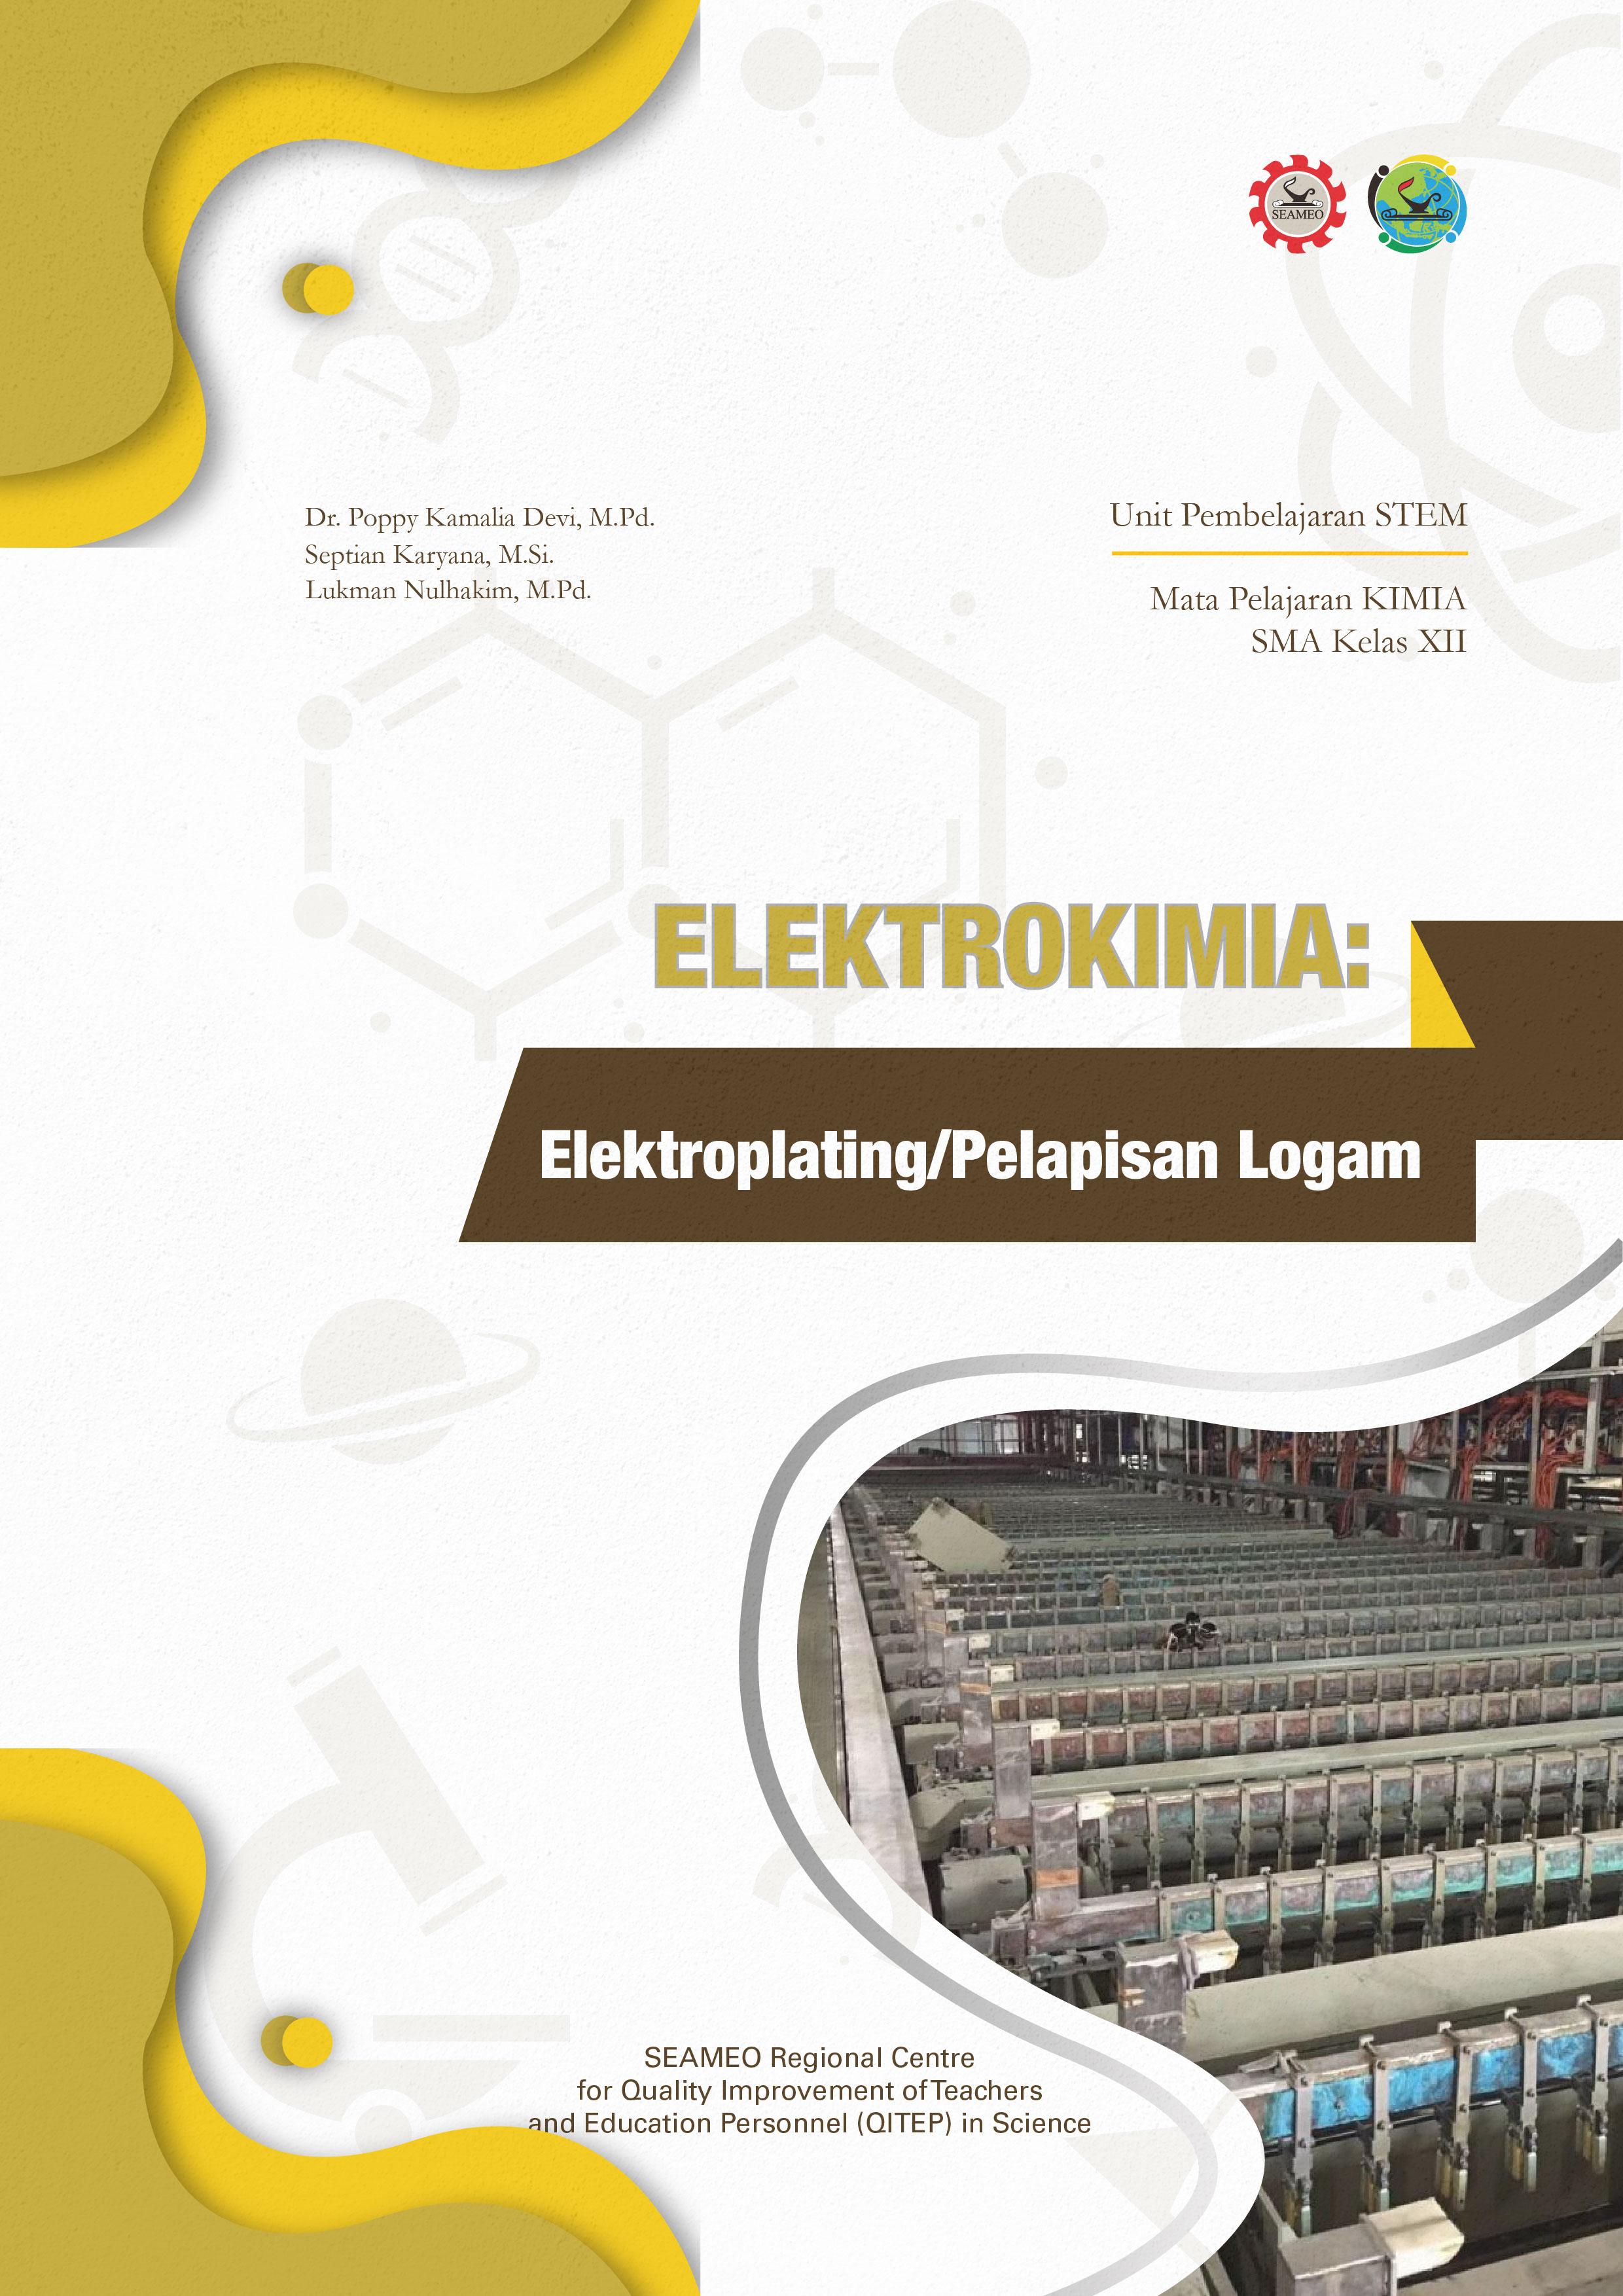 Elektrokimia: Elektroplating/Pelapisan Logam